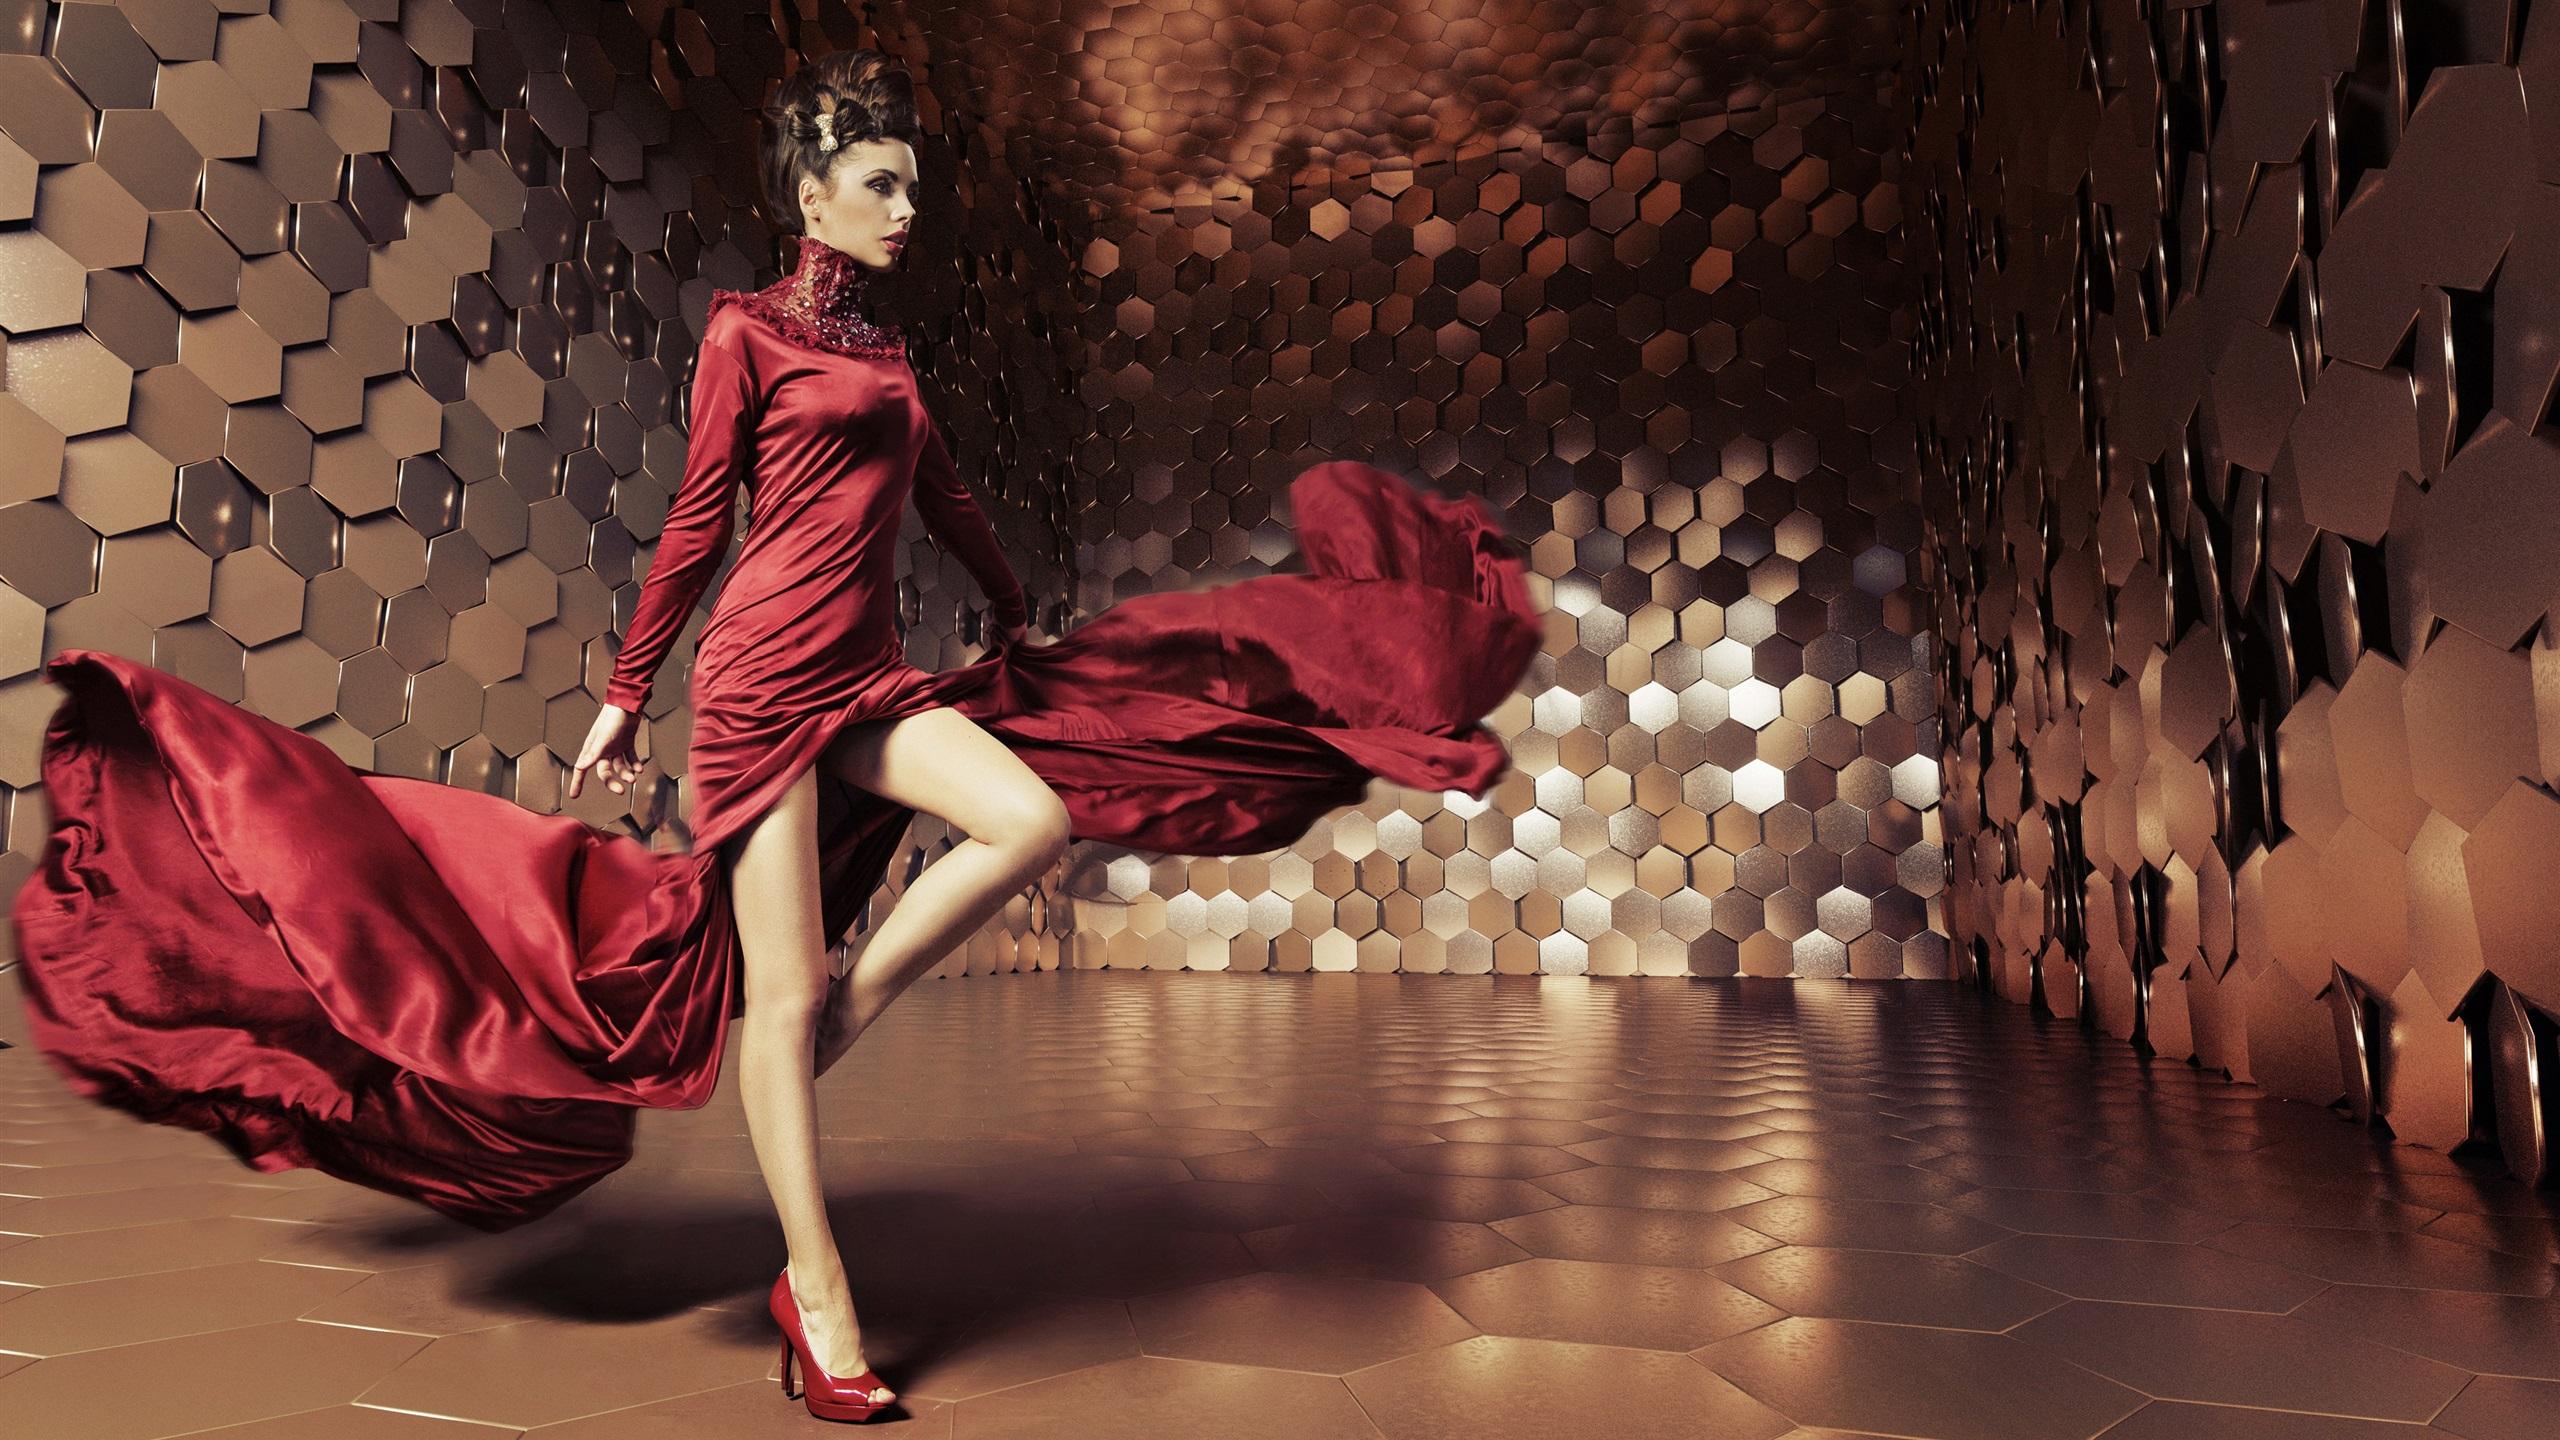 Falguni Mehta Marriage Bureau: Grooms Wanted Artistic dance fashions towson